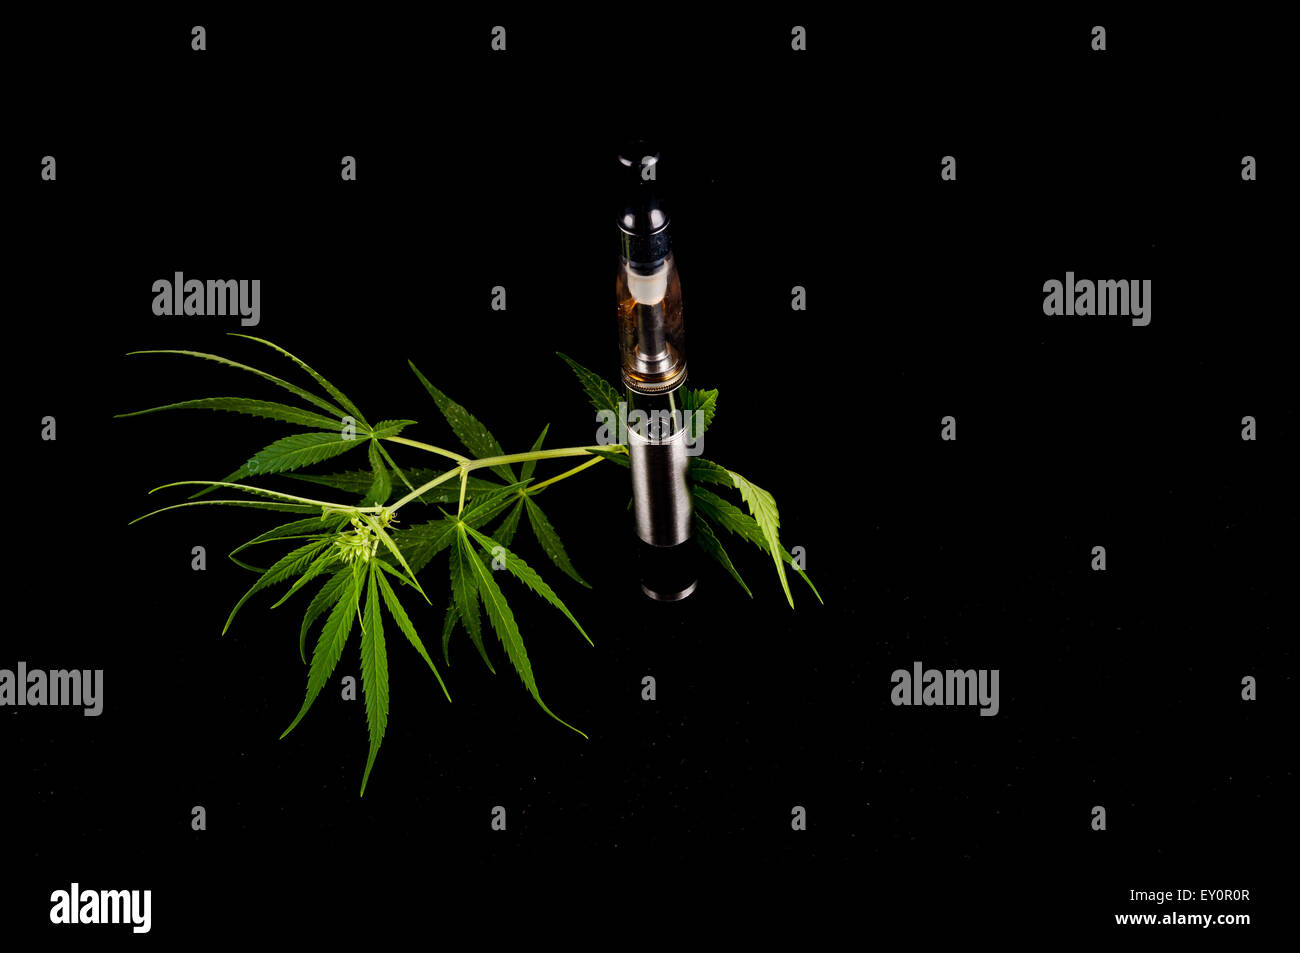 Electronic Cigarette E-cig Vaporizer - Stock Image